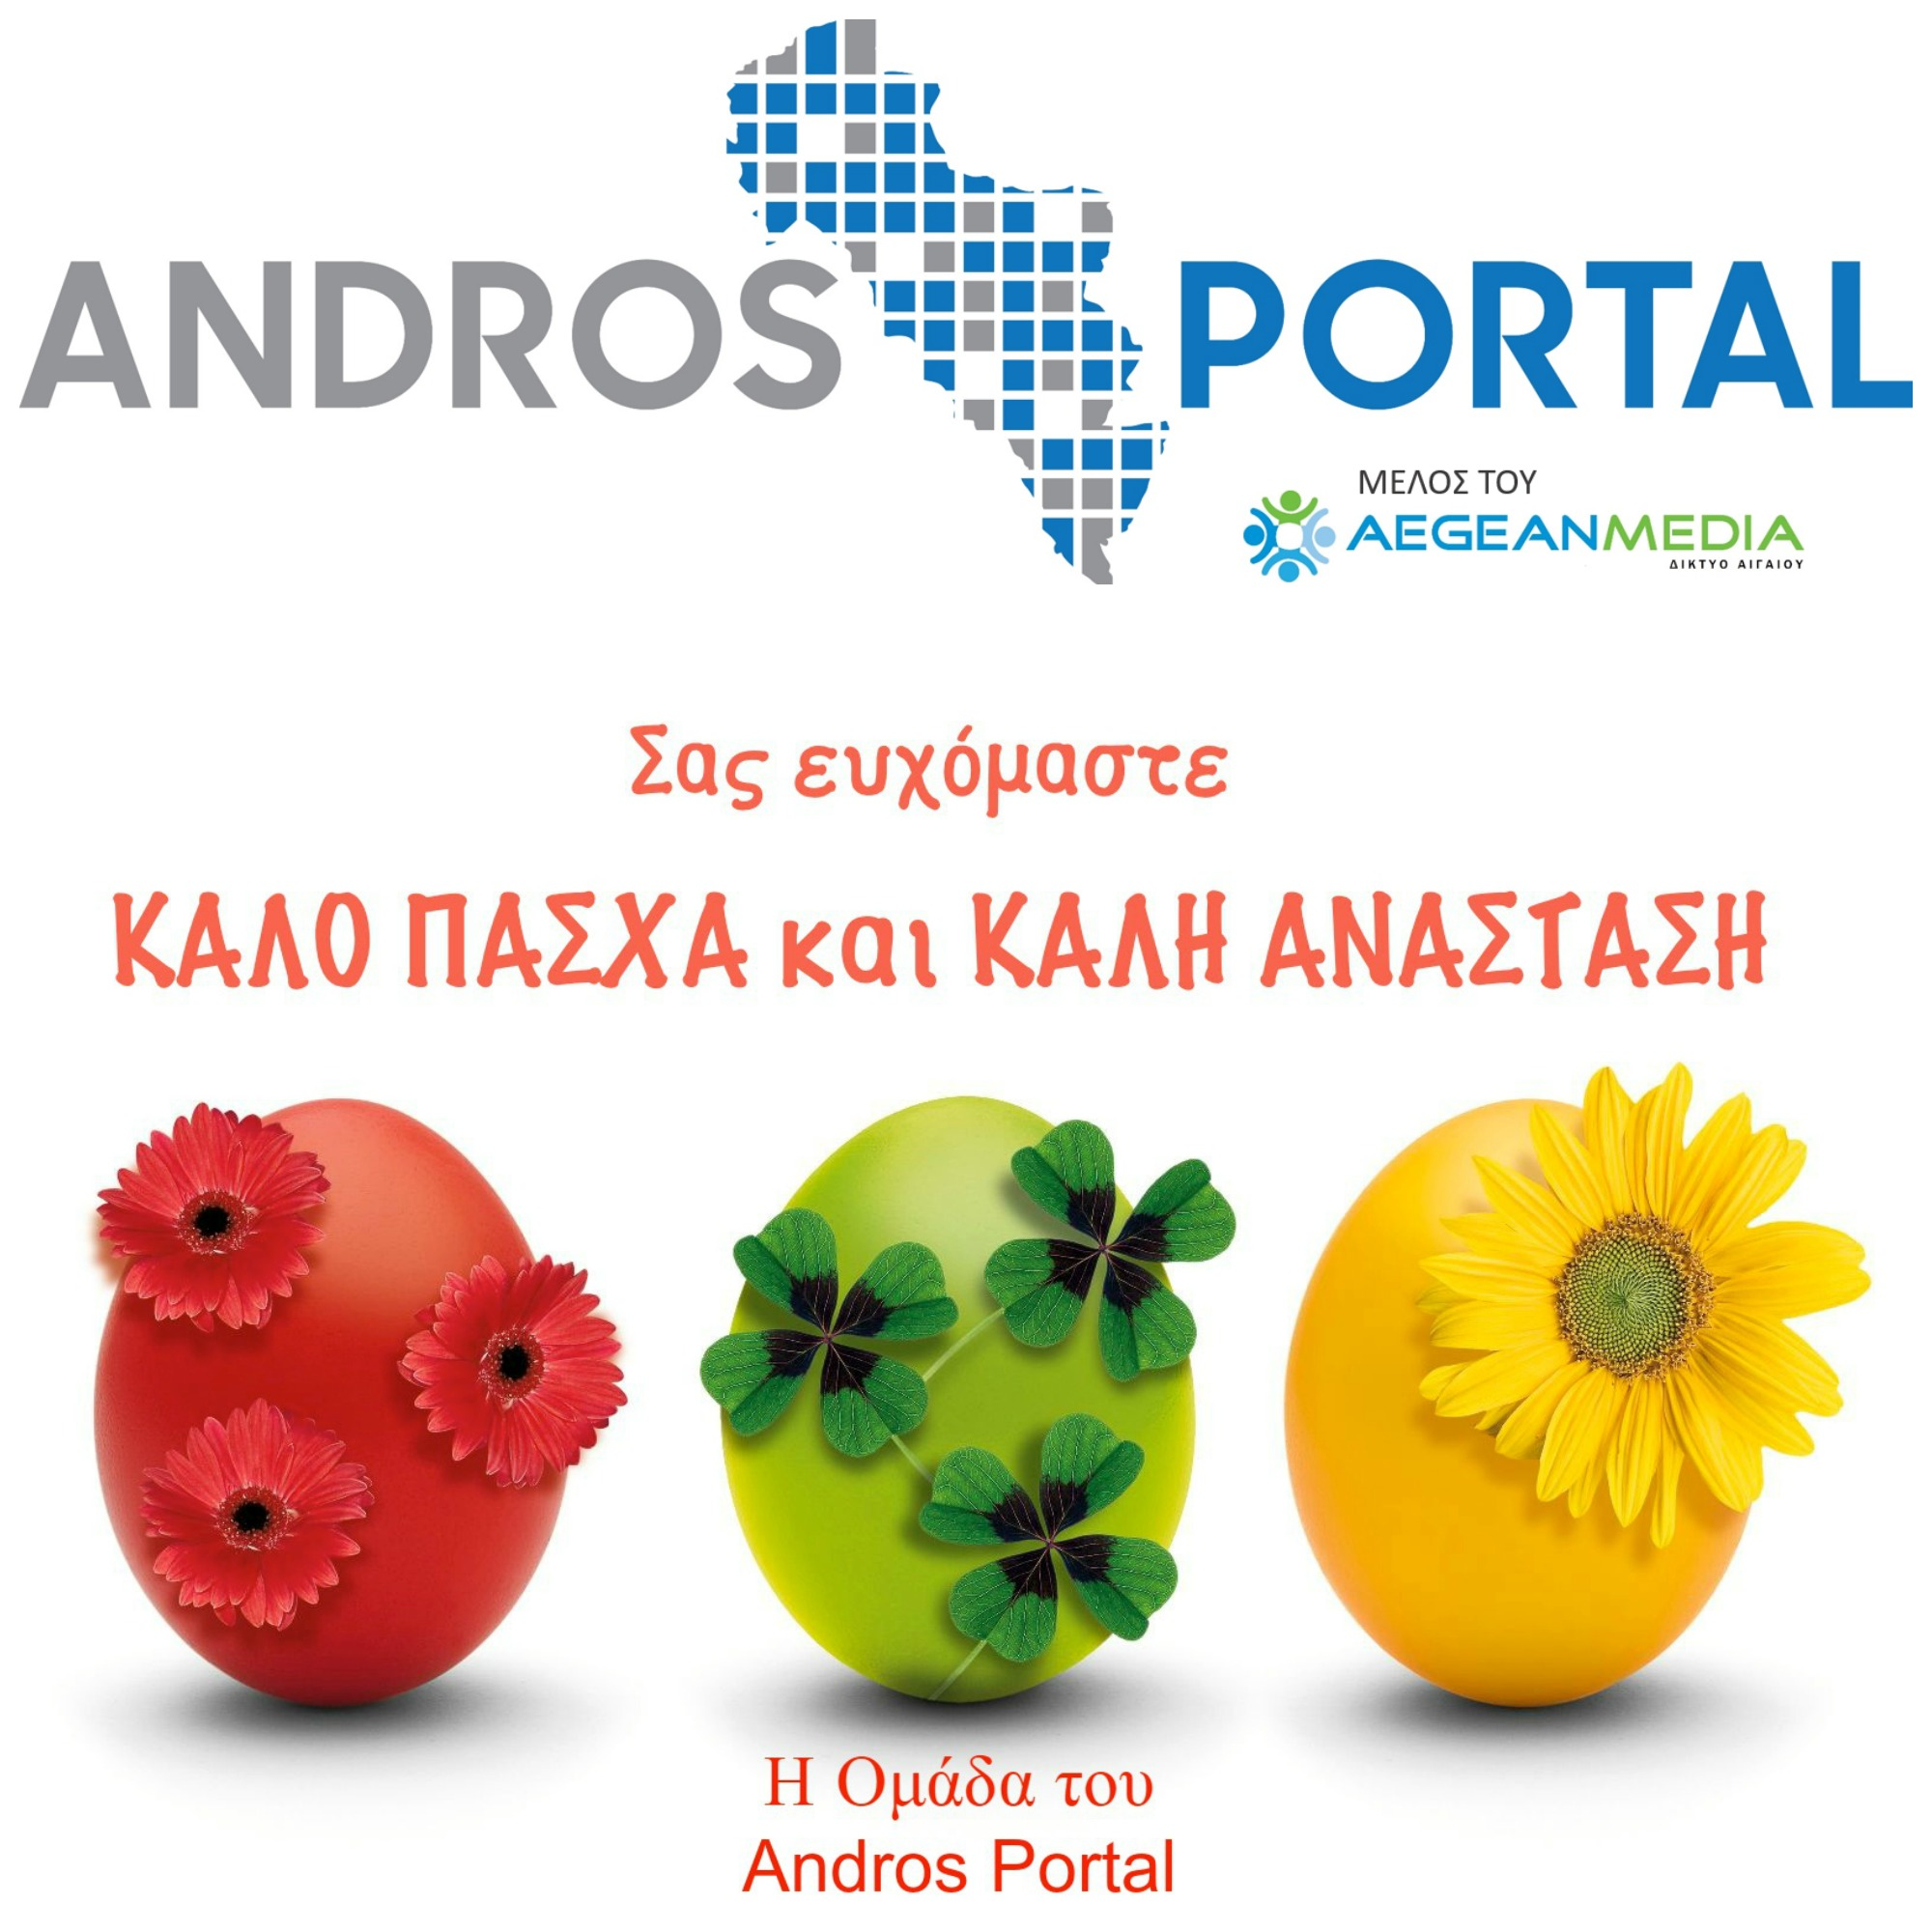 187a78ba6e Η Ομάδα του Andros Portal σας εύχεται Καλό Πάσχα και Καλή Ανάσταση!  Ημερομηνία  28 Απριλίου